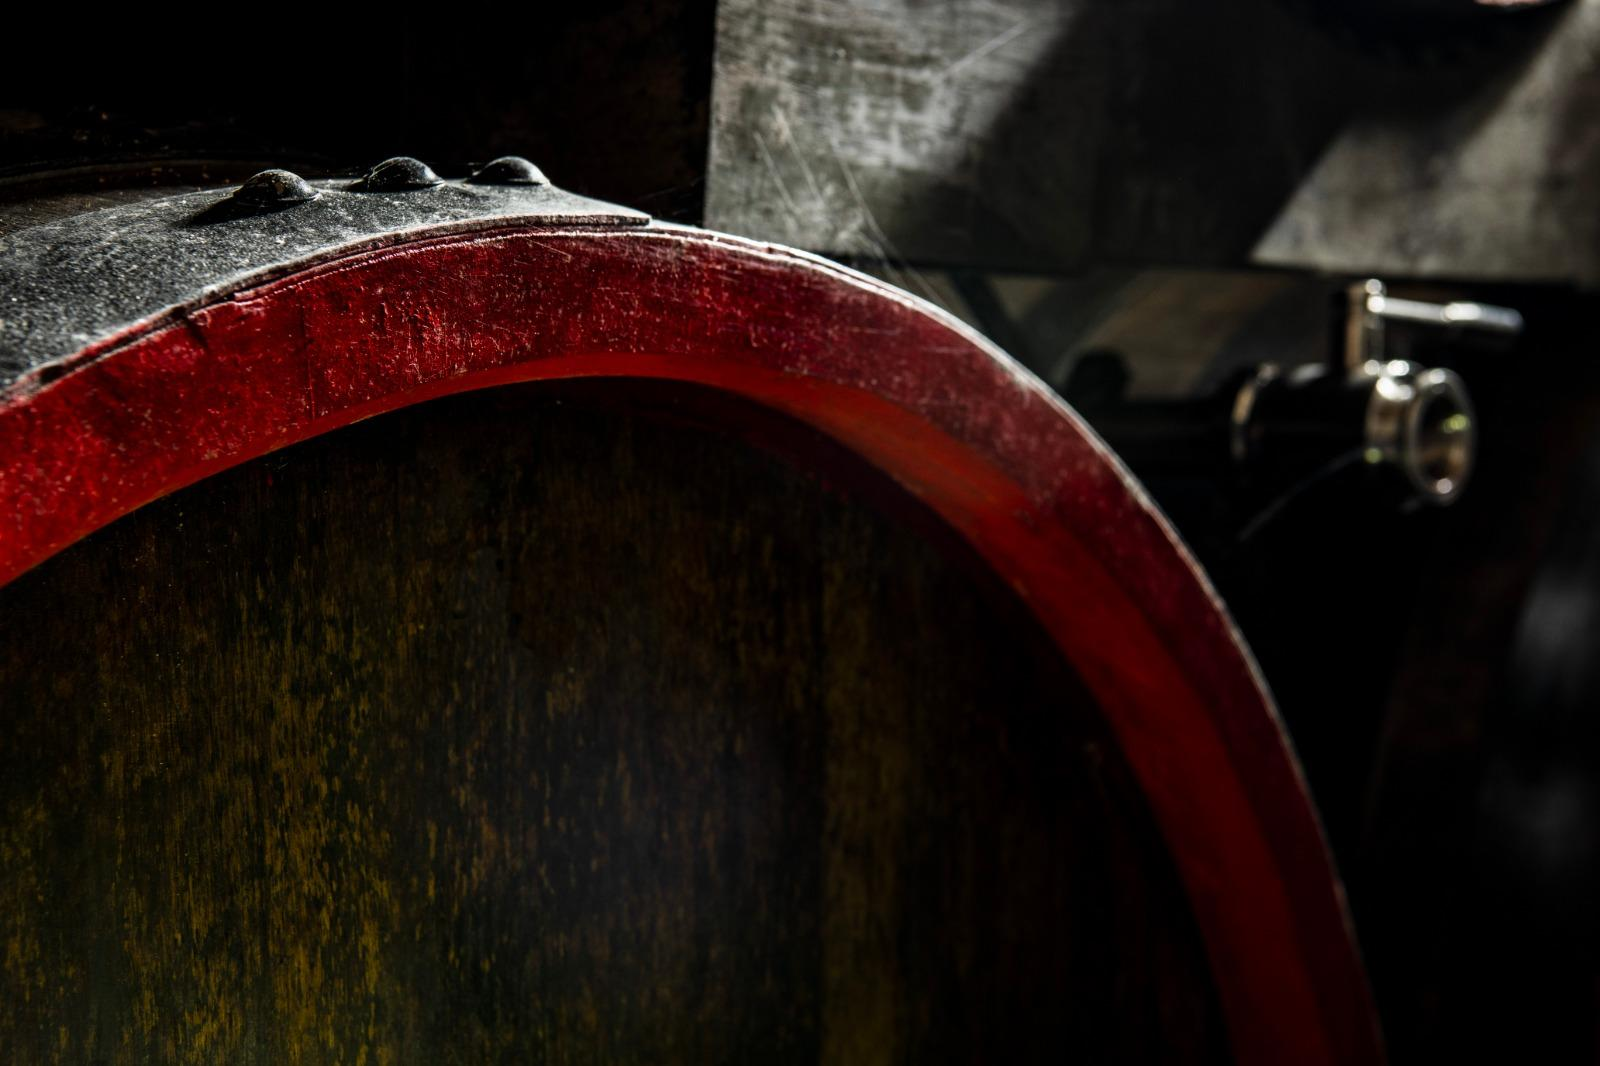 Winegrowing